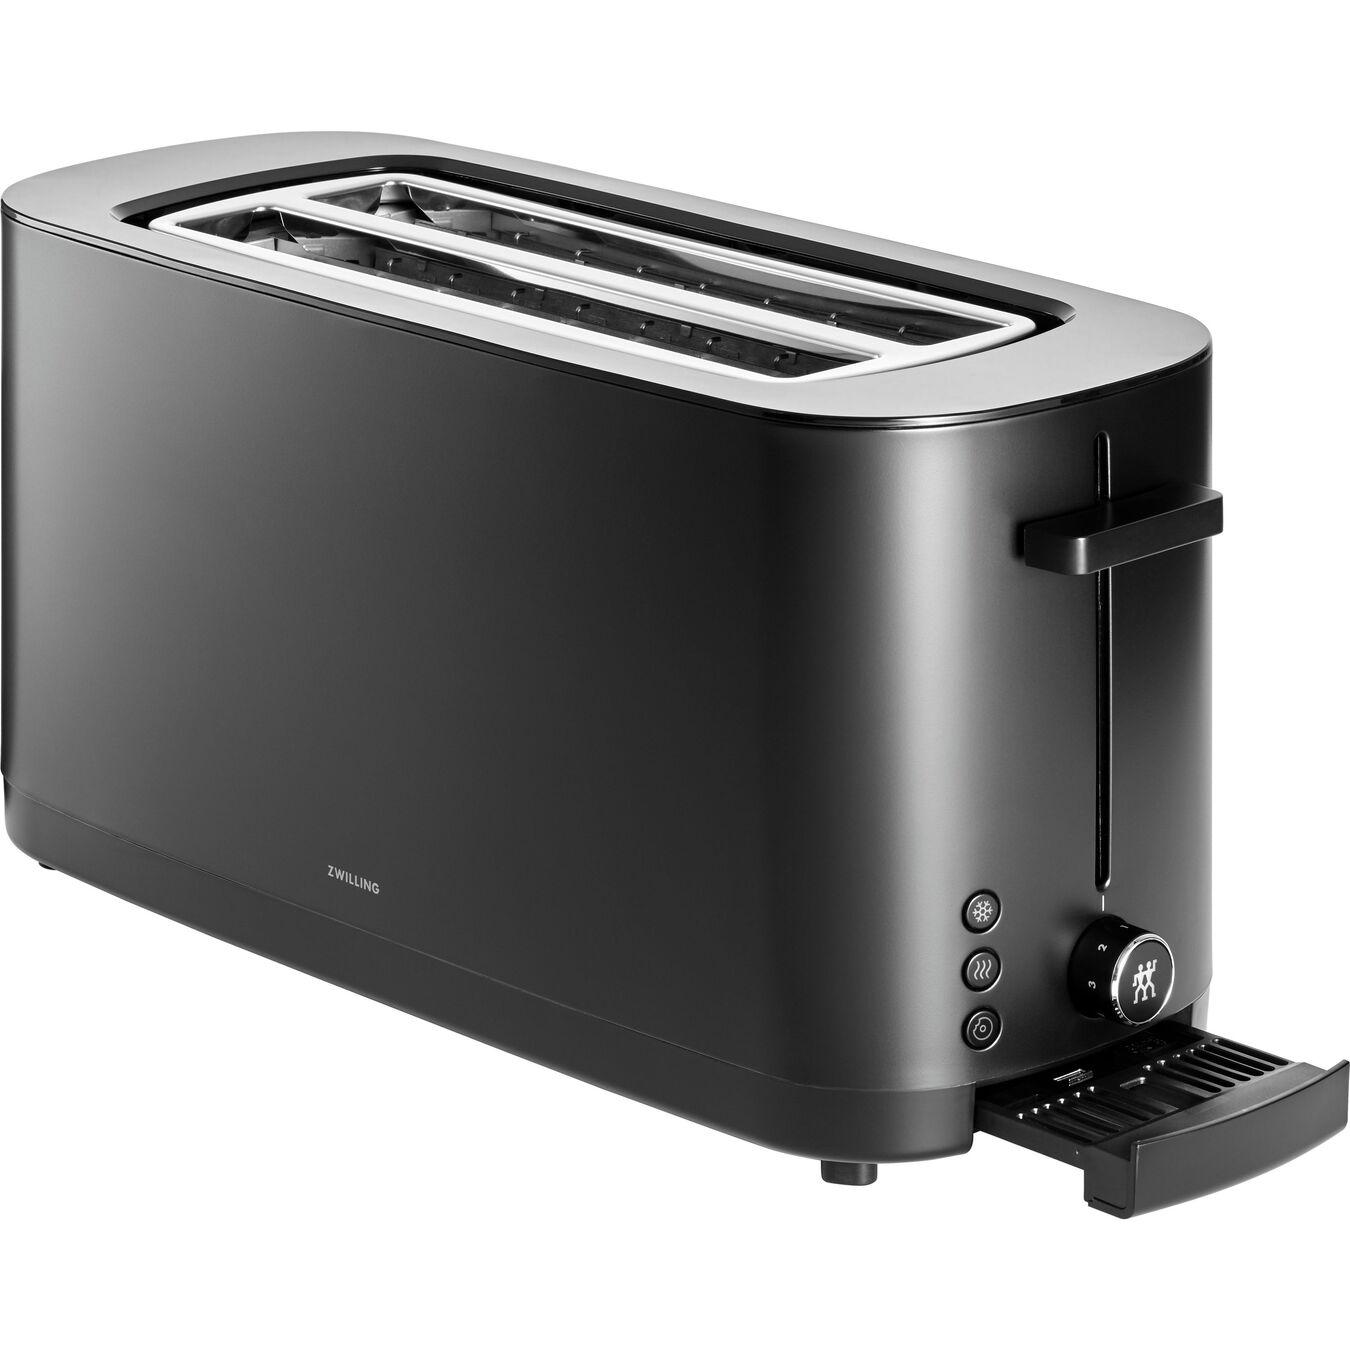 2 Long Slot Toaster - Black,,large 3